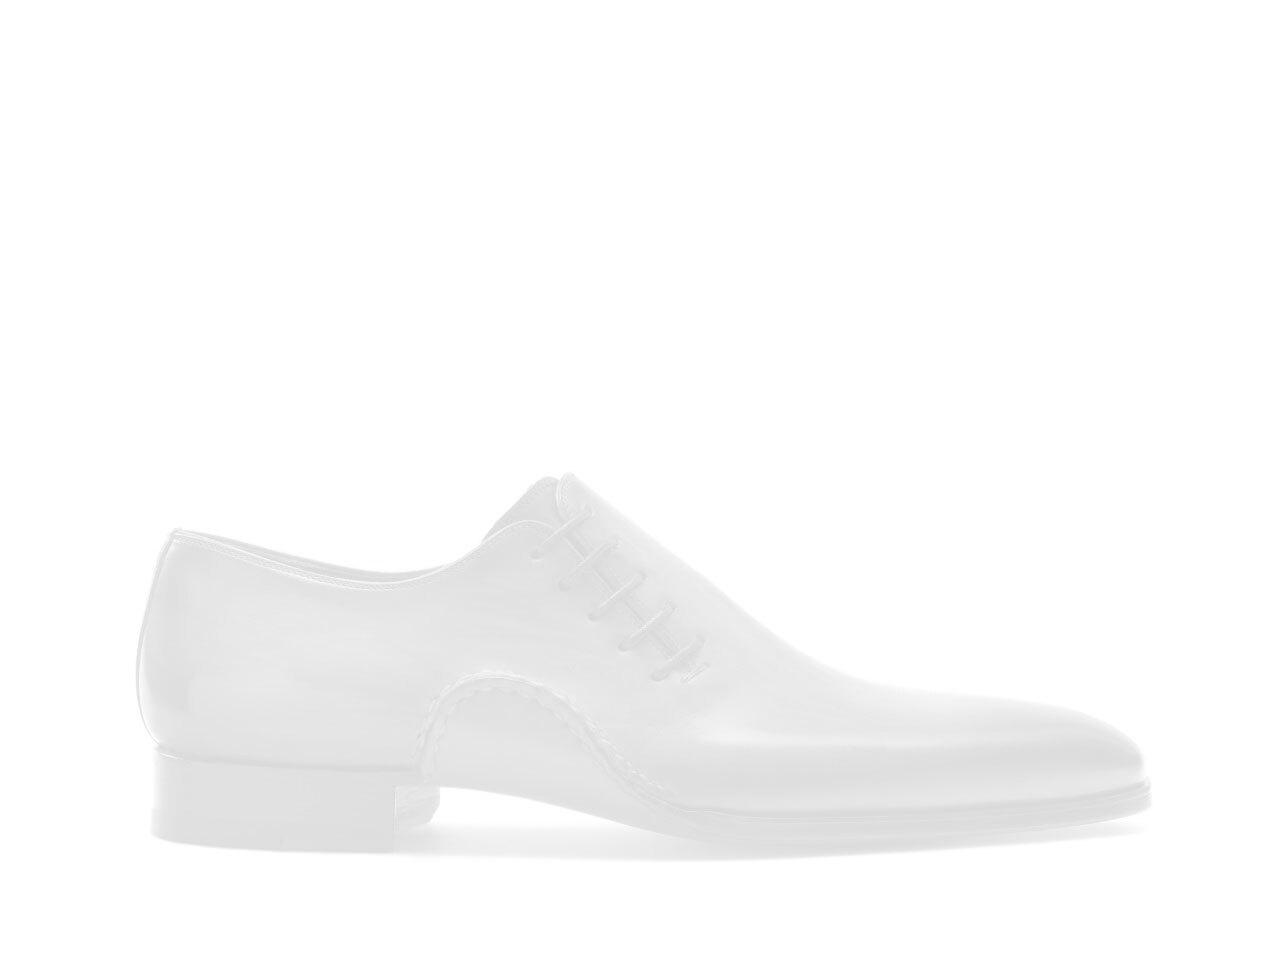 Product Shot of Cognac & Cuero-colored Essential Shoe care kit